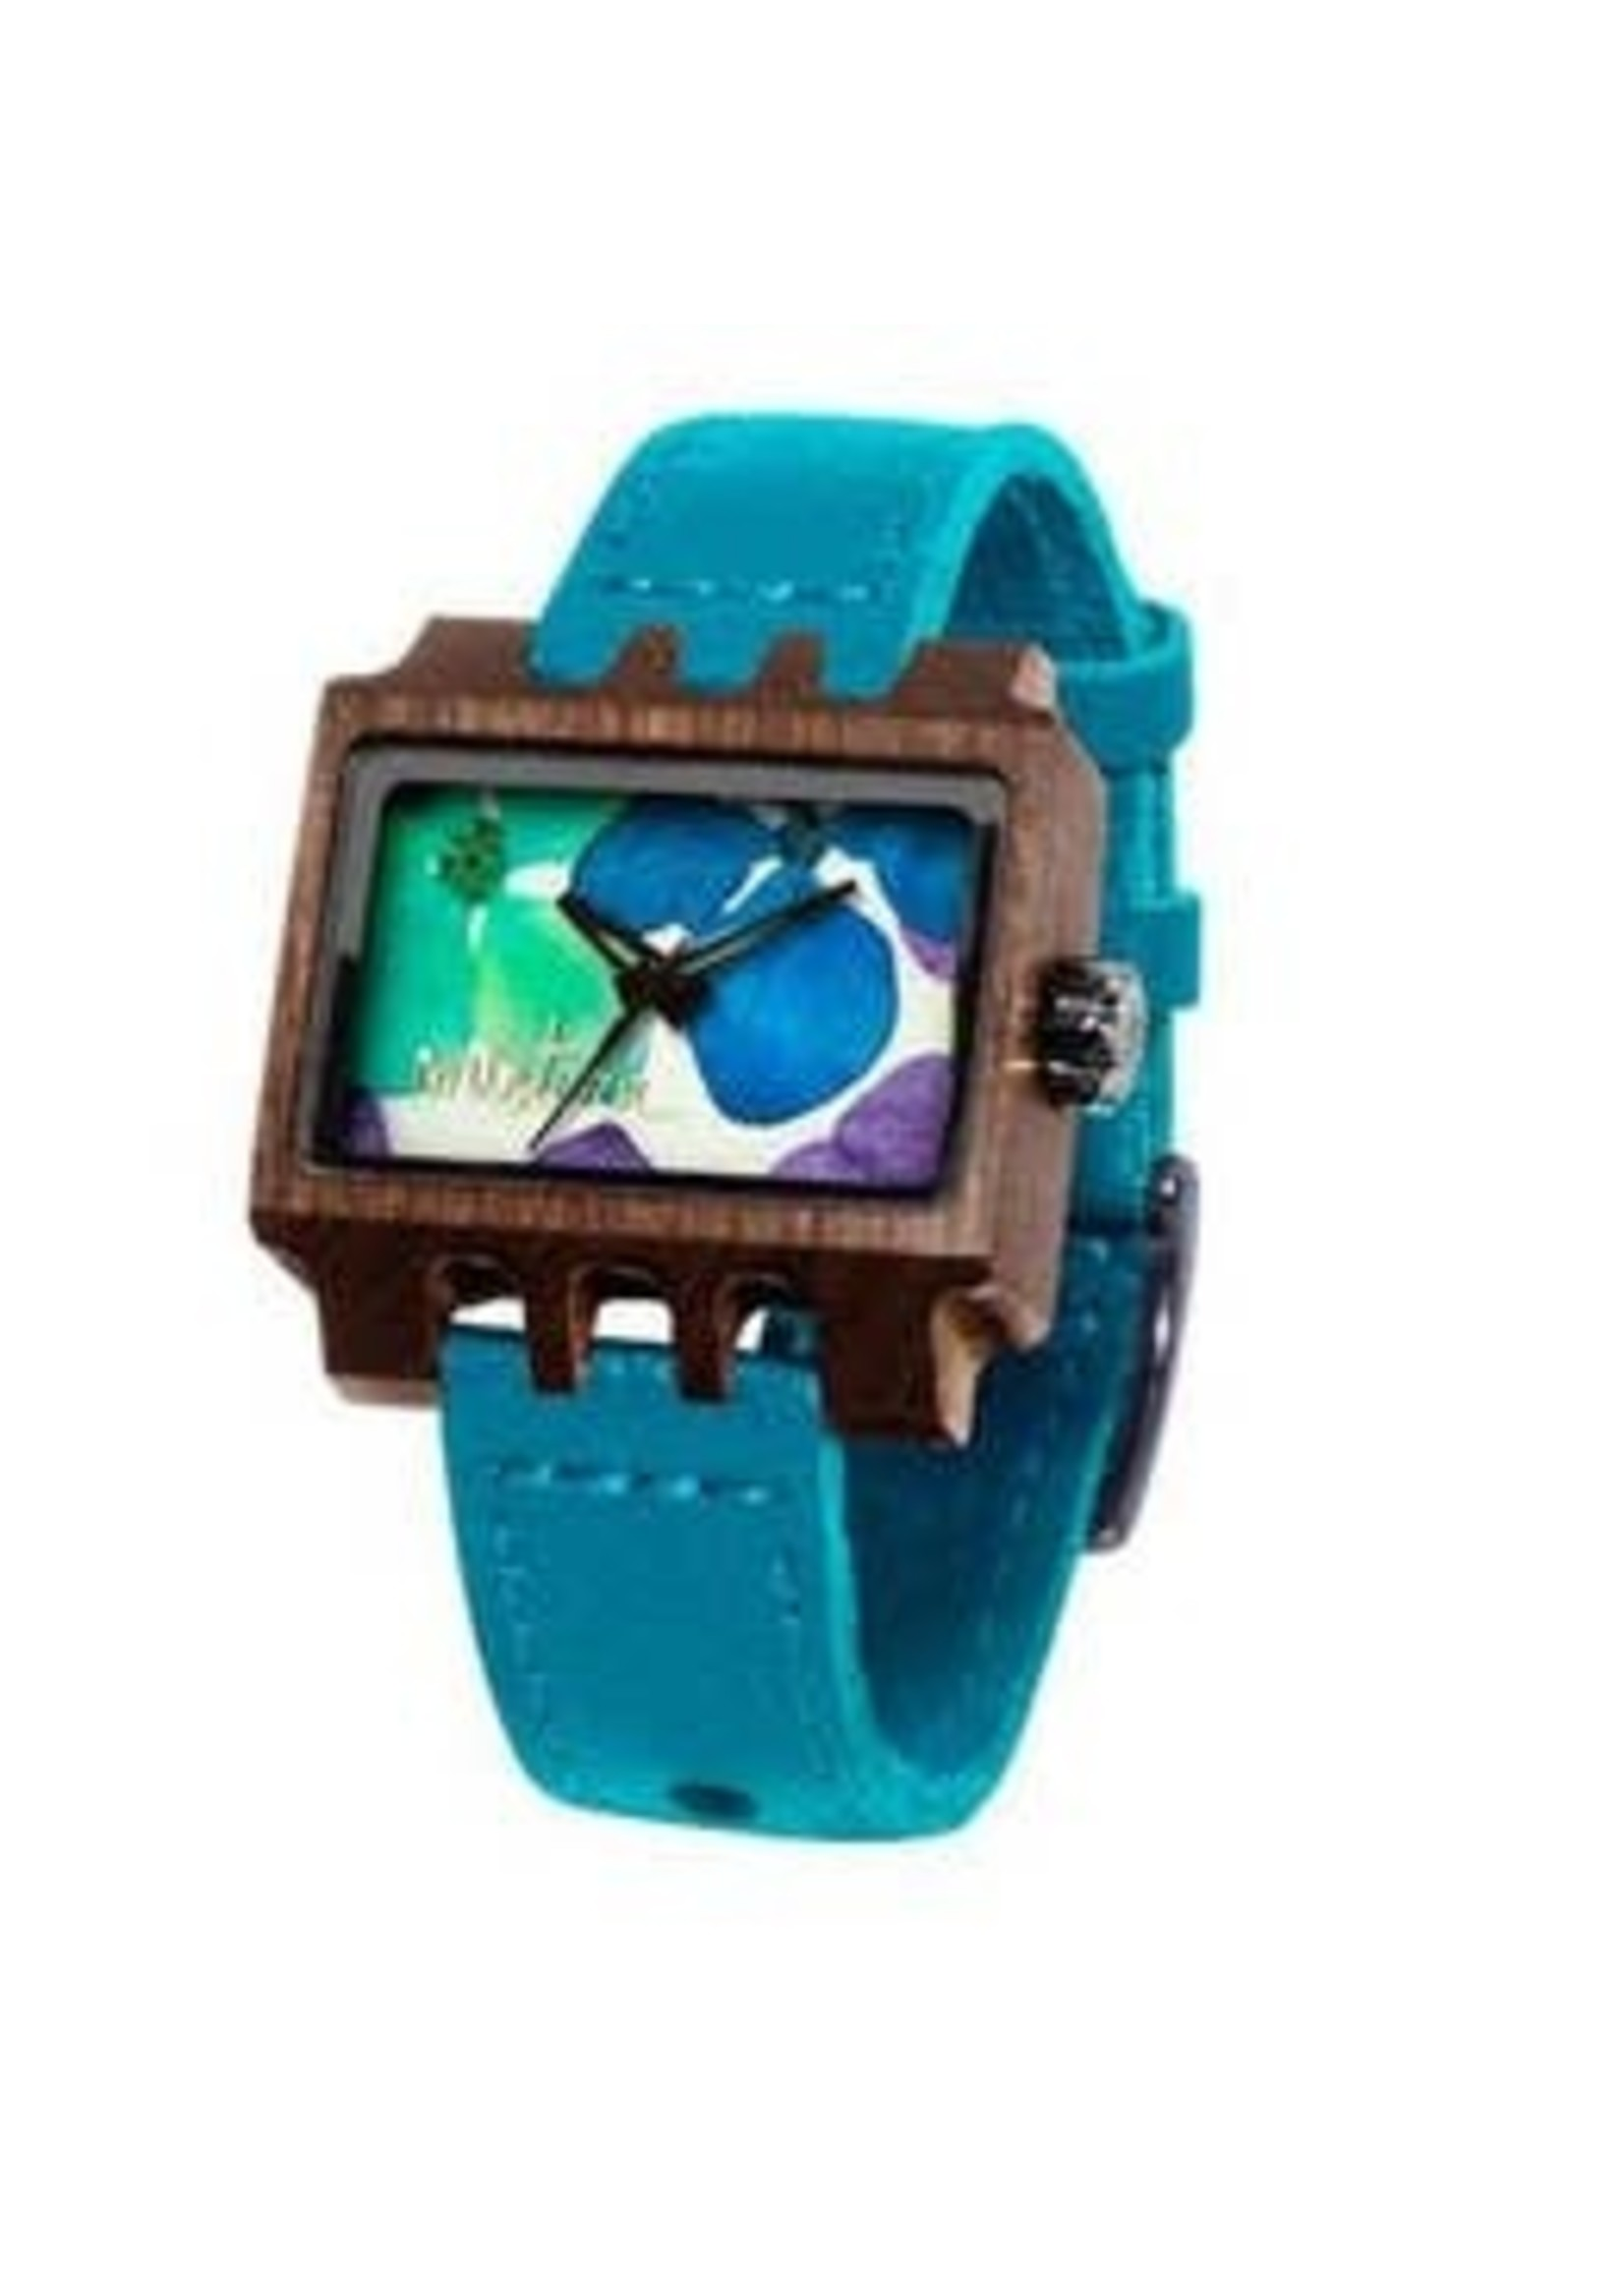 Lenzo Turquoise Pui Bali Watch-Mistura Watch